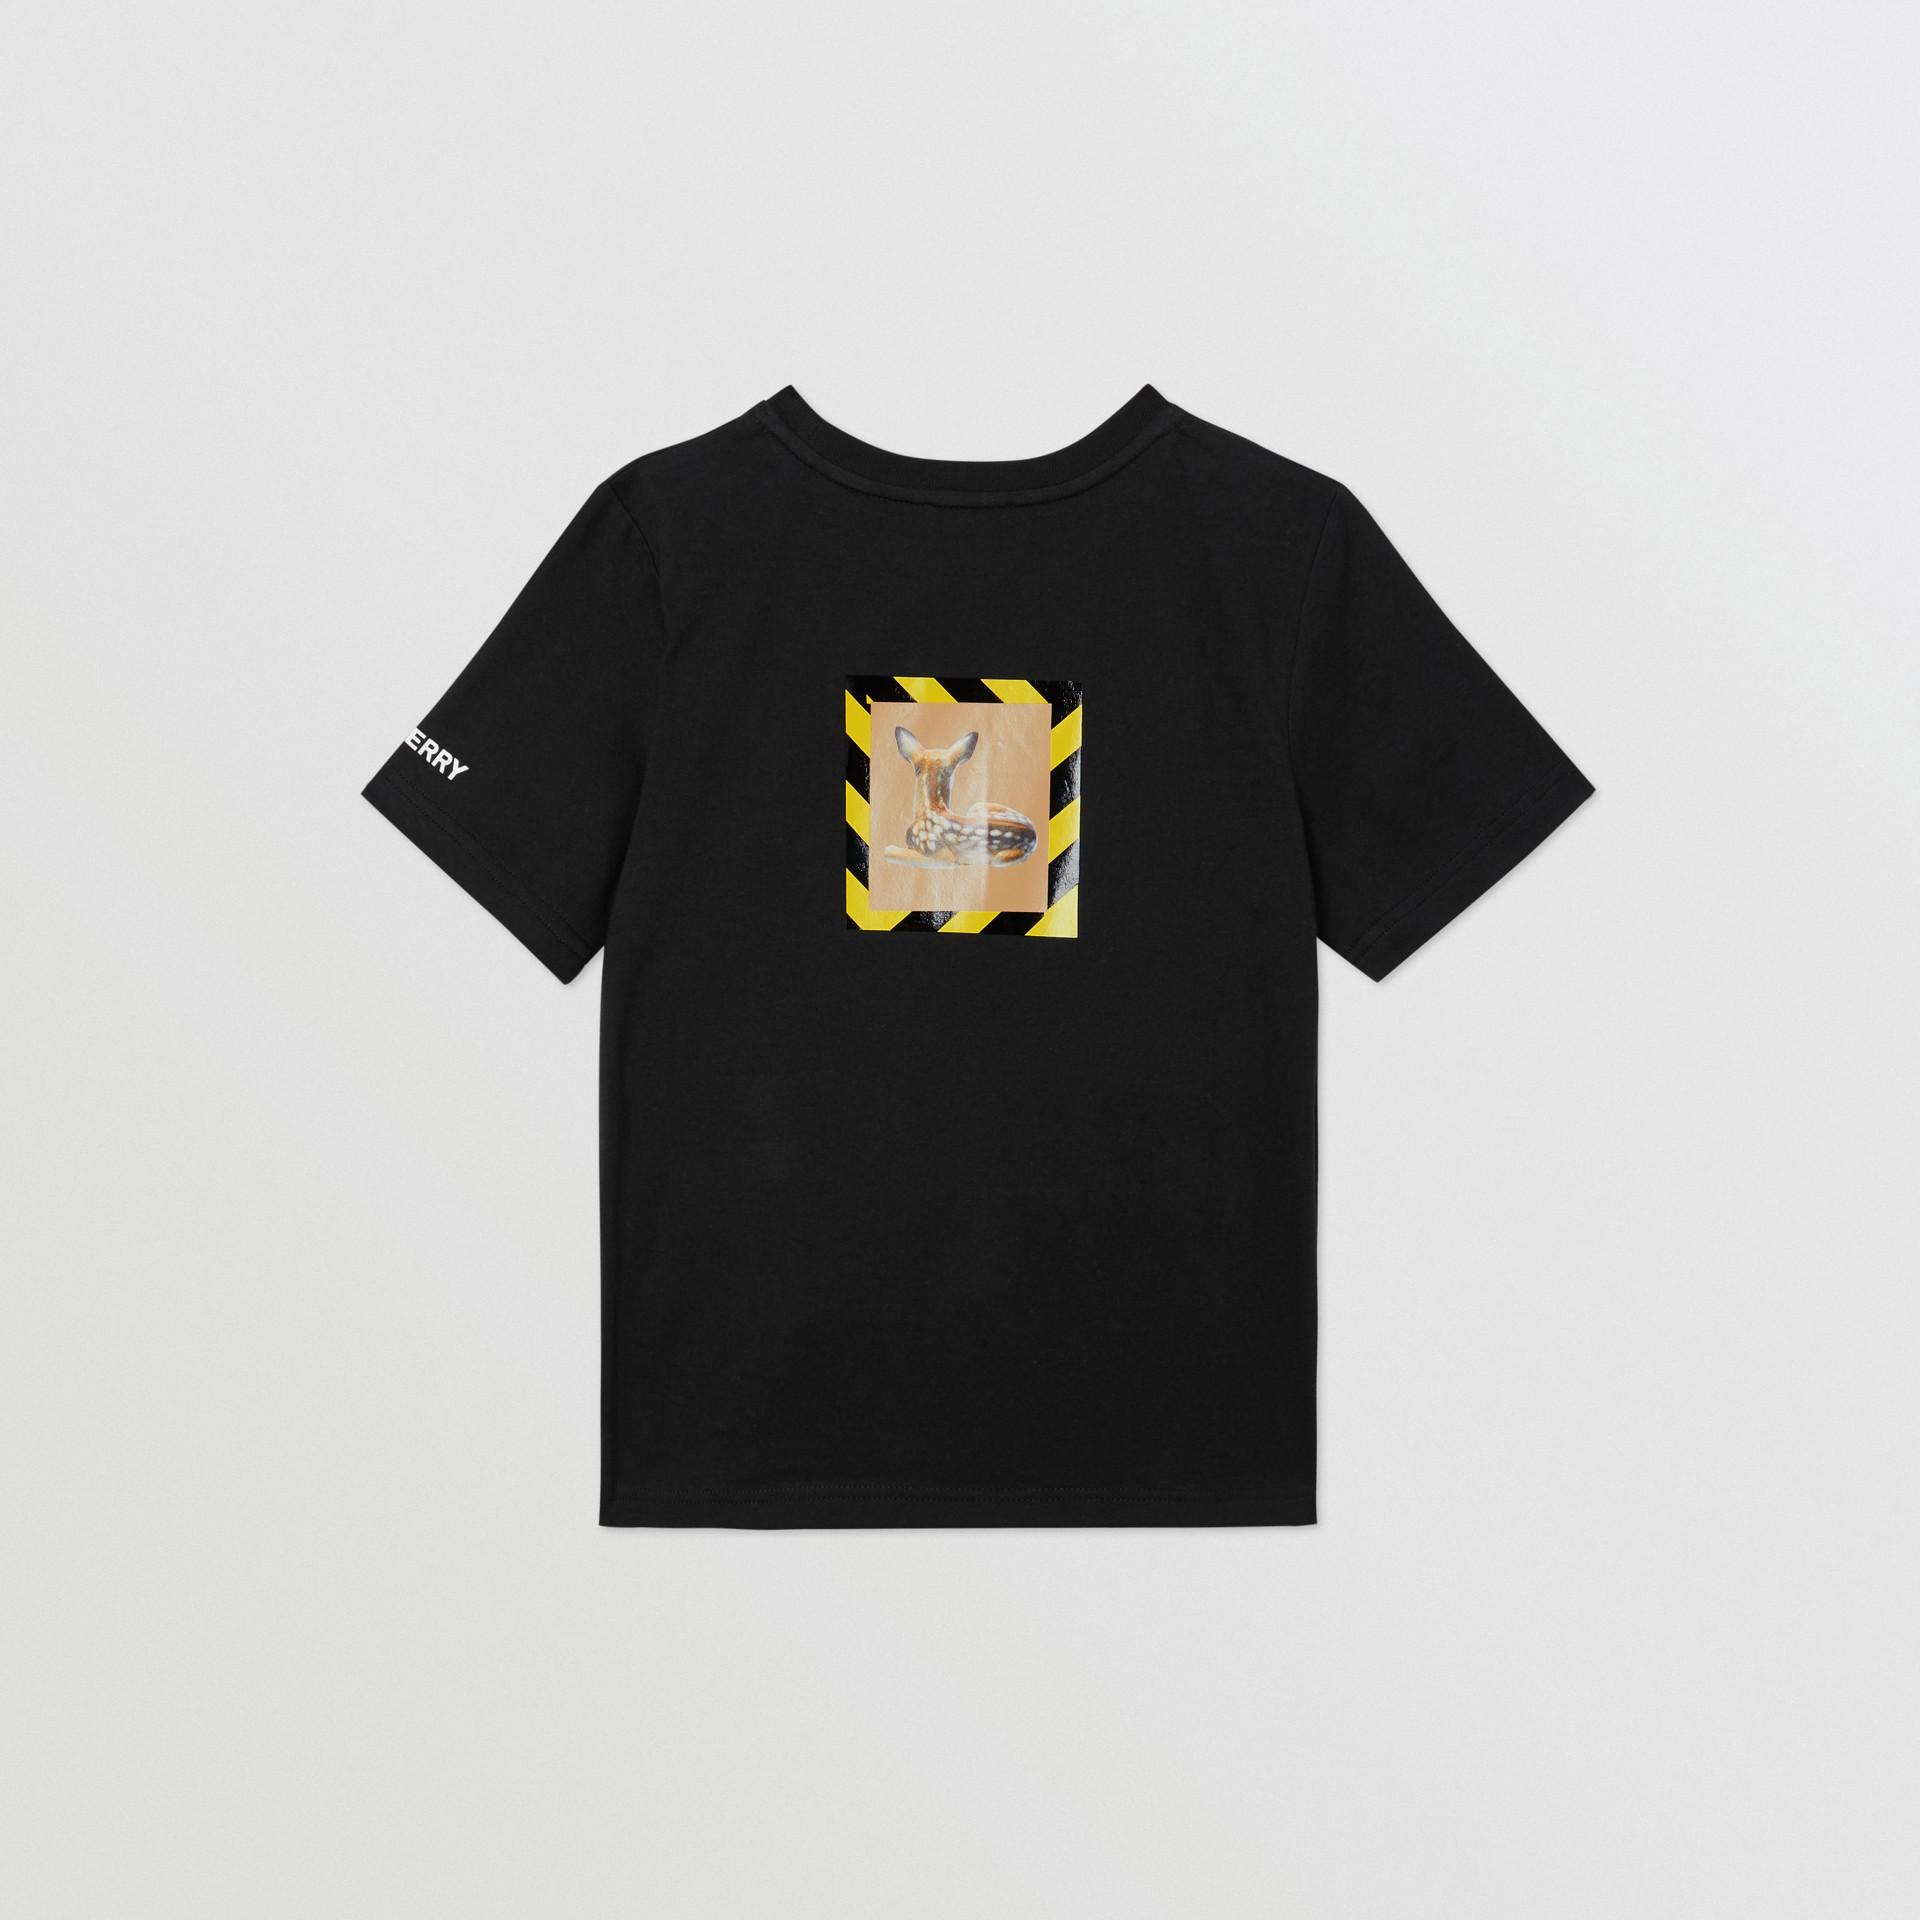 Deer Print Cotton T-shirt in Black   Burberry Australia - gallery image 4